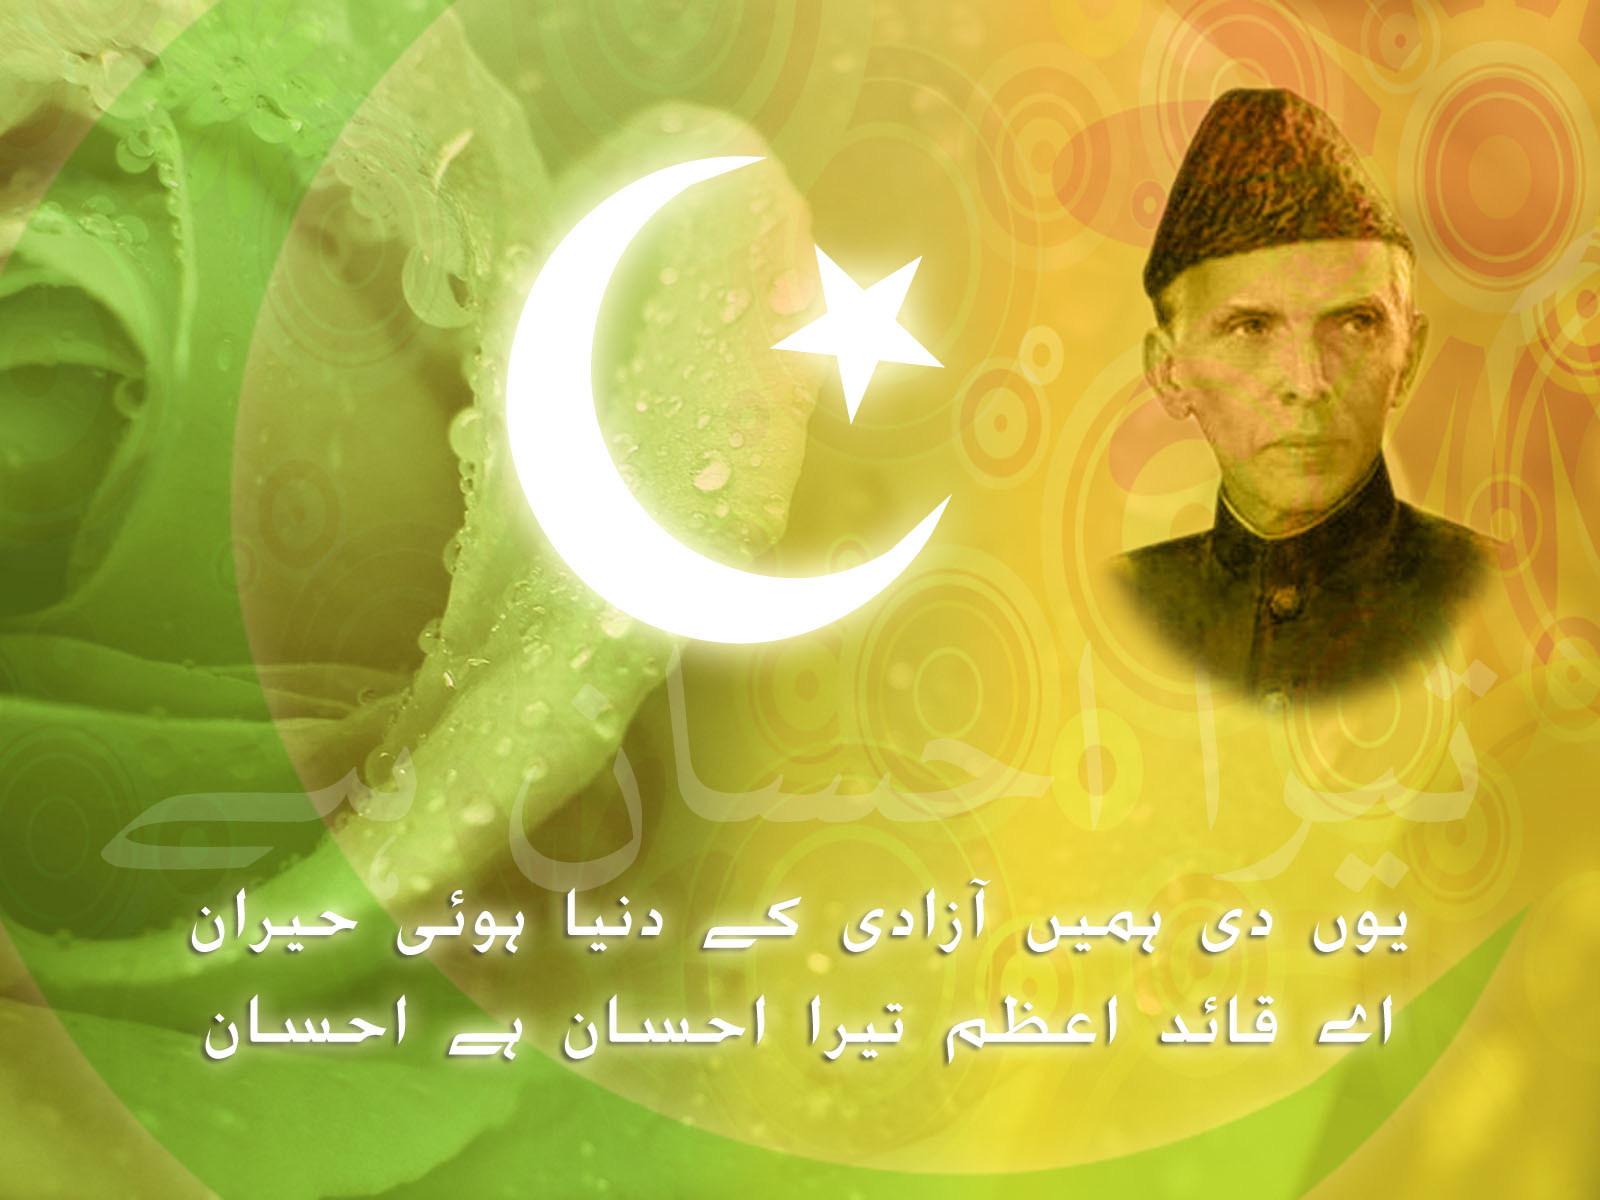 14th August Pakistan Wallpaper